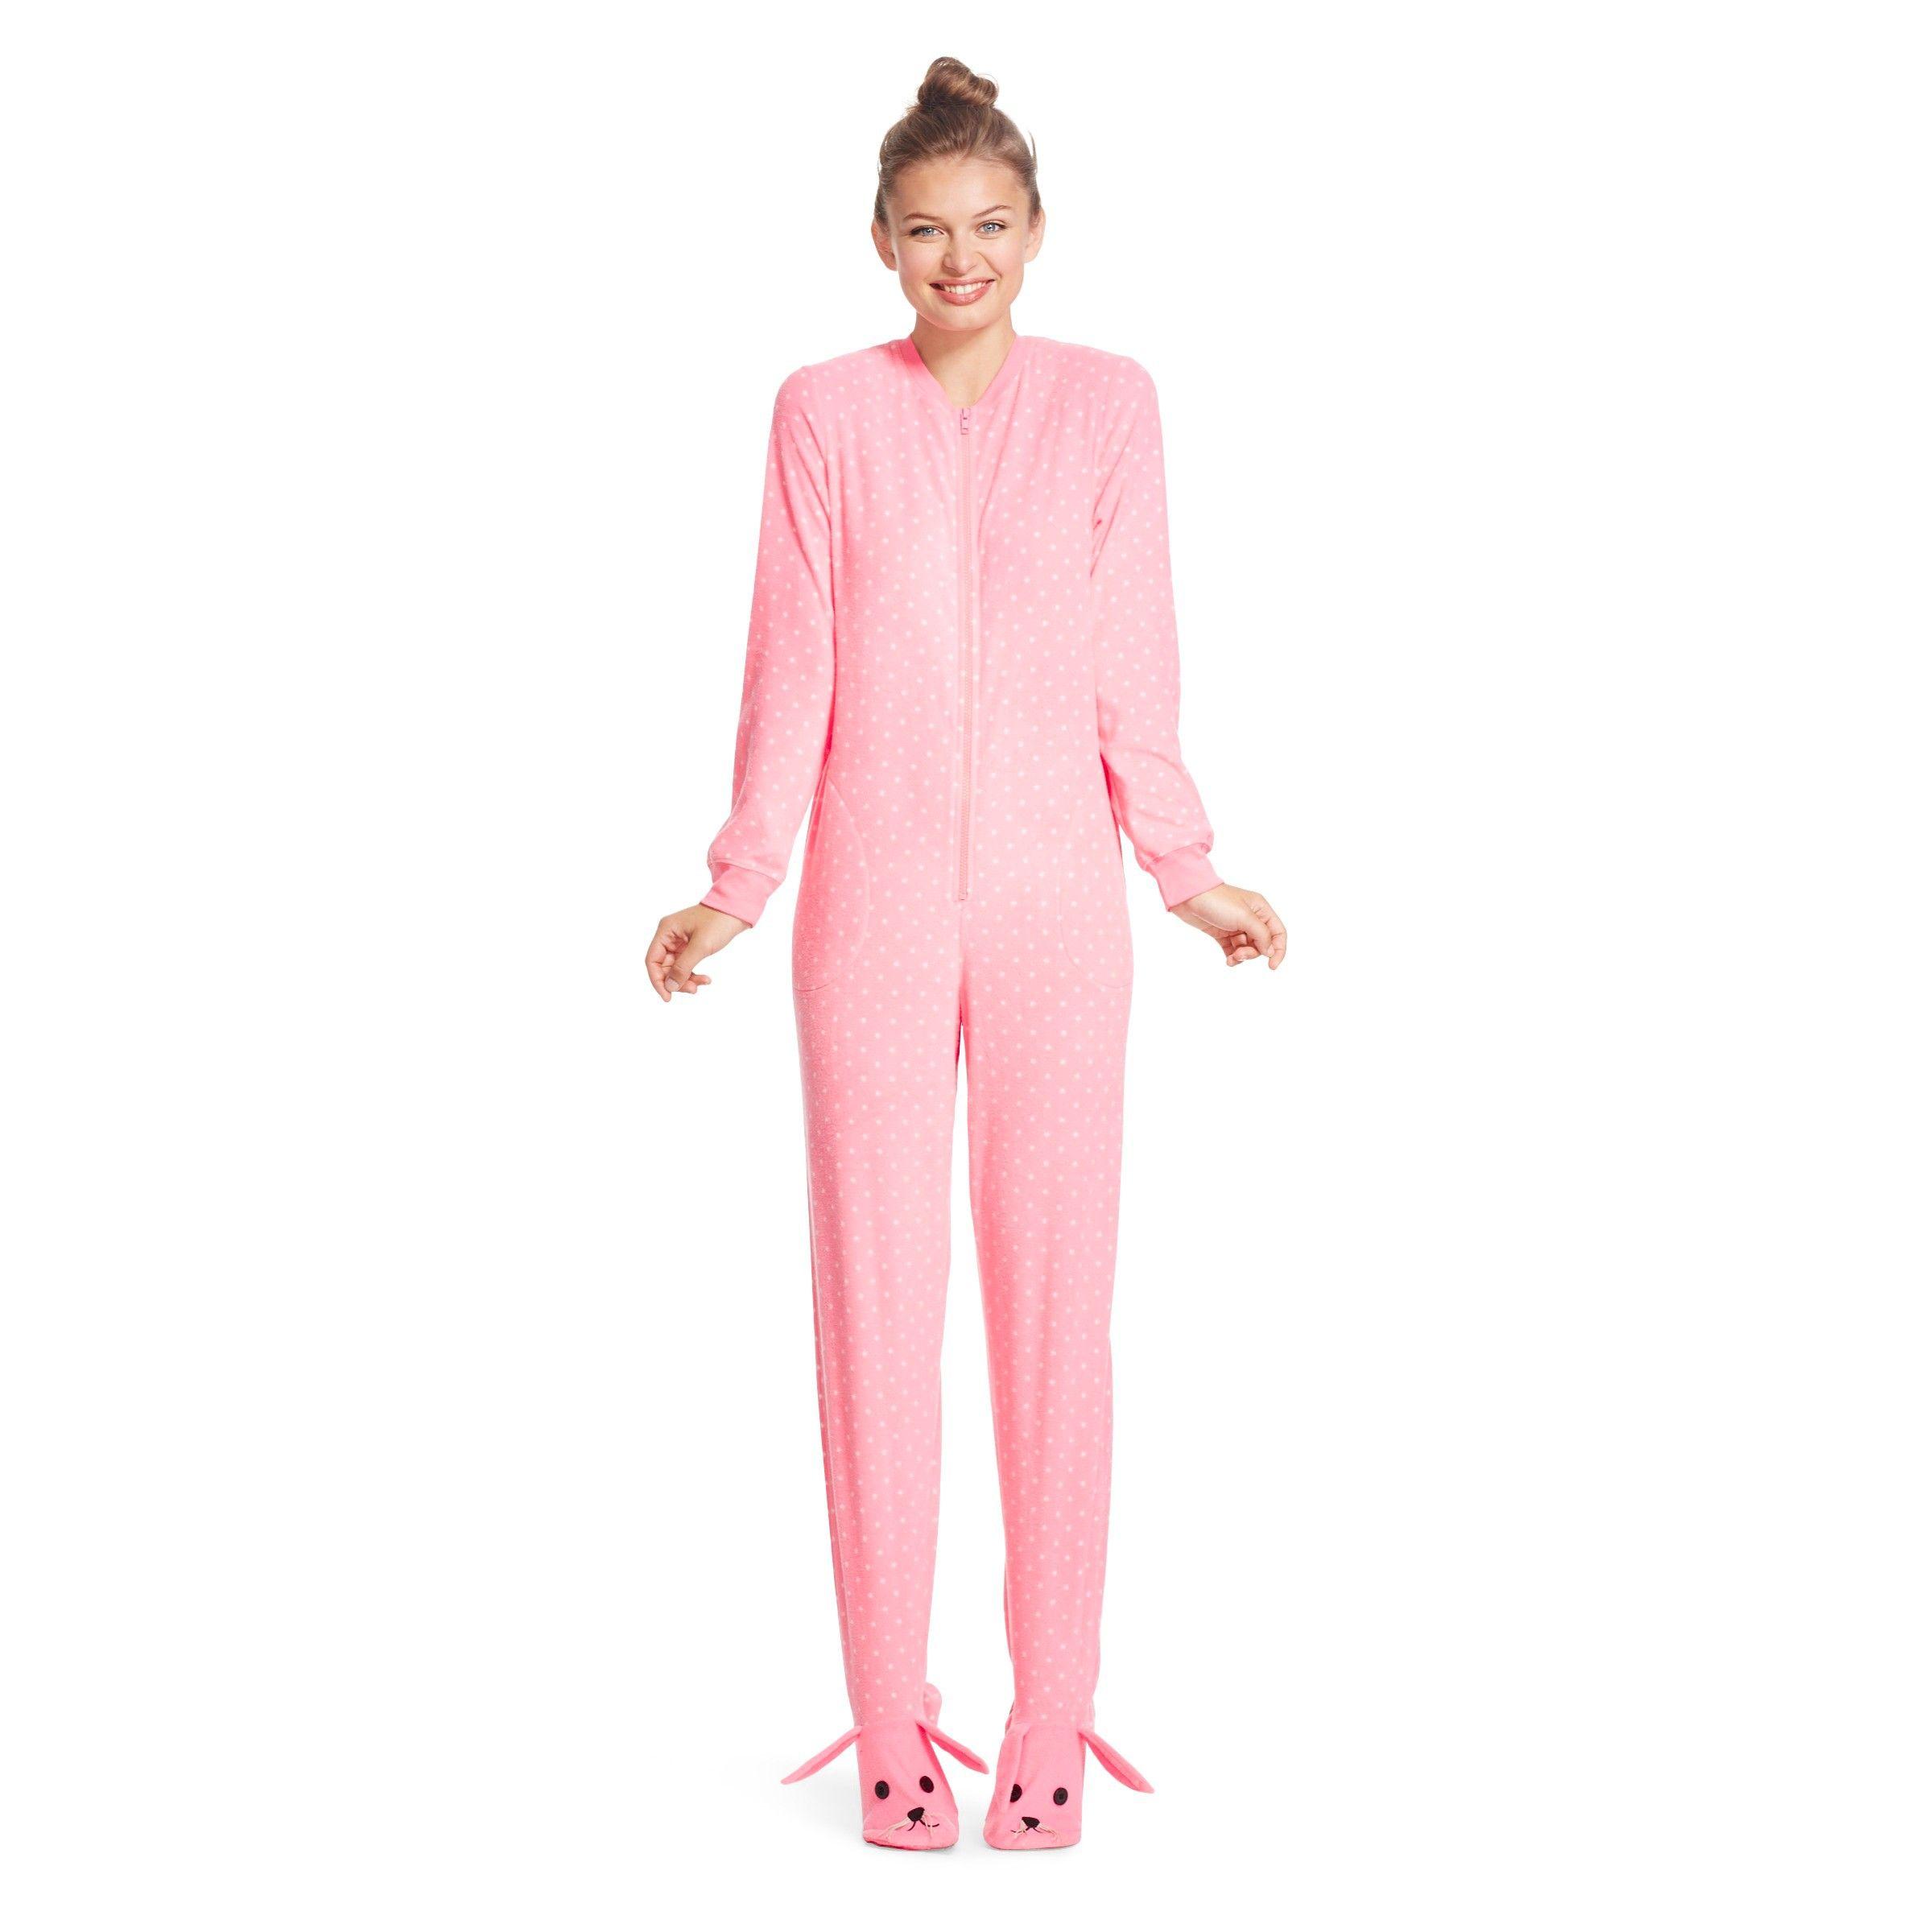 NN Footie Pajama Bunny Target